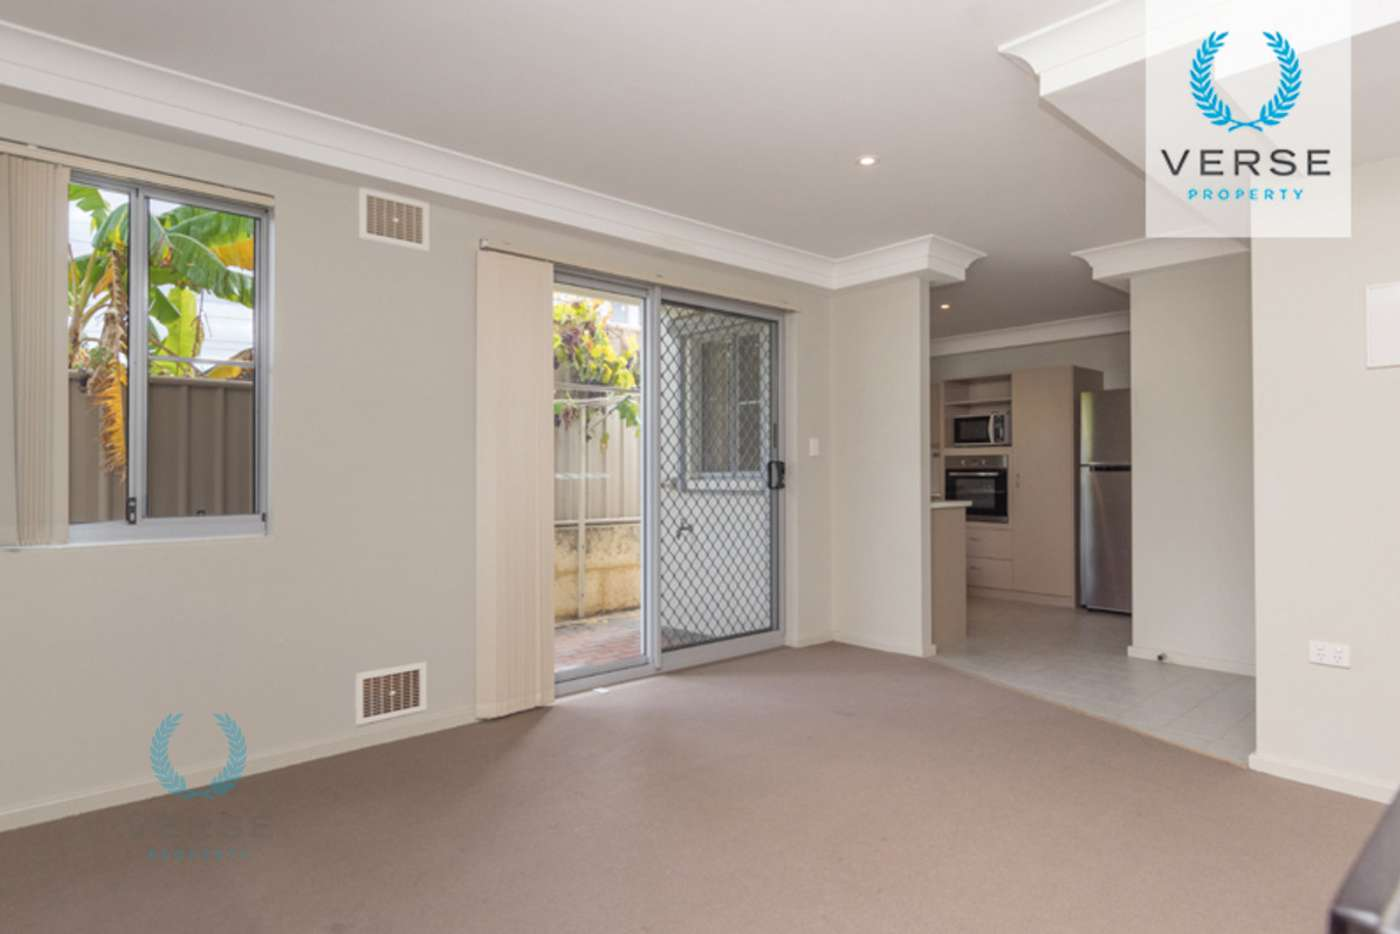 Seventh view of Homely apartment listing, 2/329 Sevenoaks Street, Cannington WA 6107